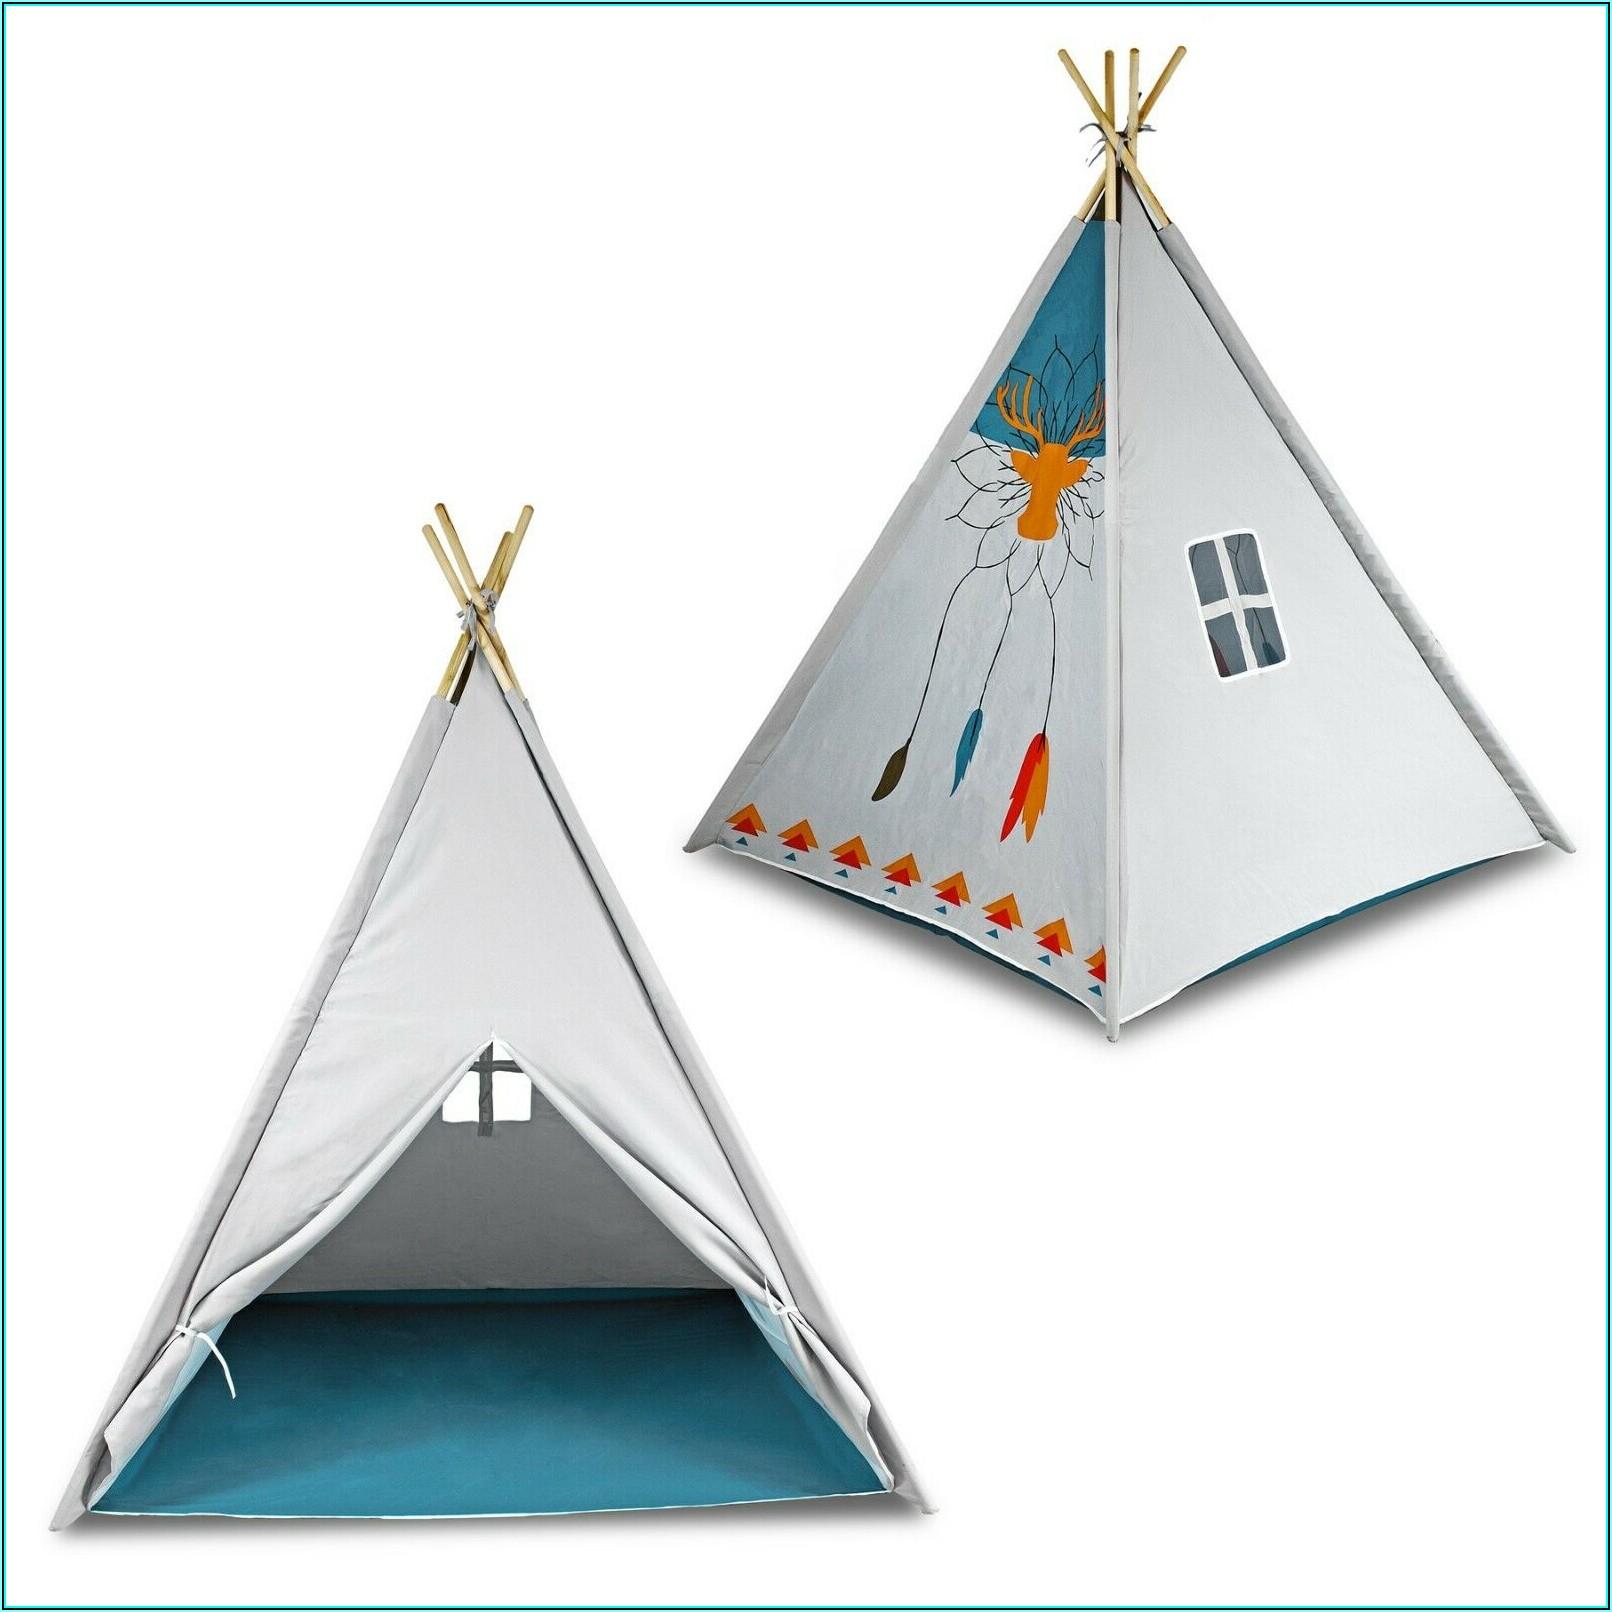 Tipi Zelt Kinderzimmer Kaufen